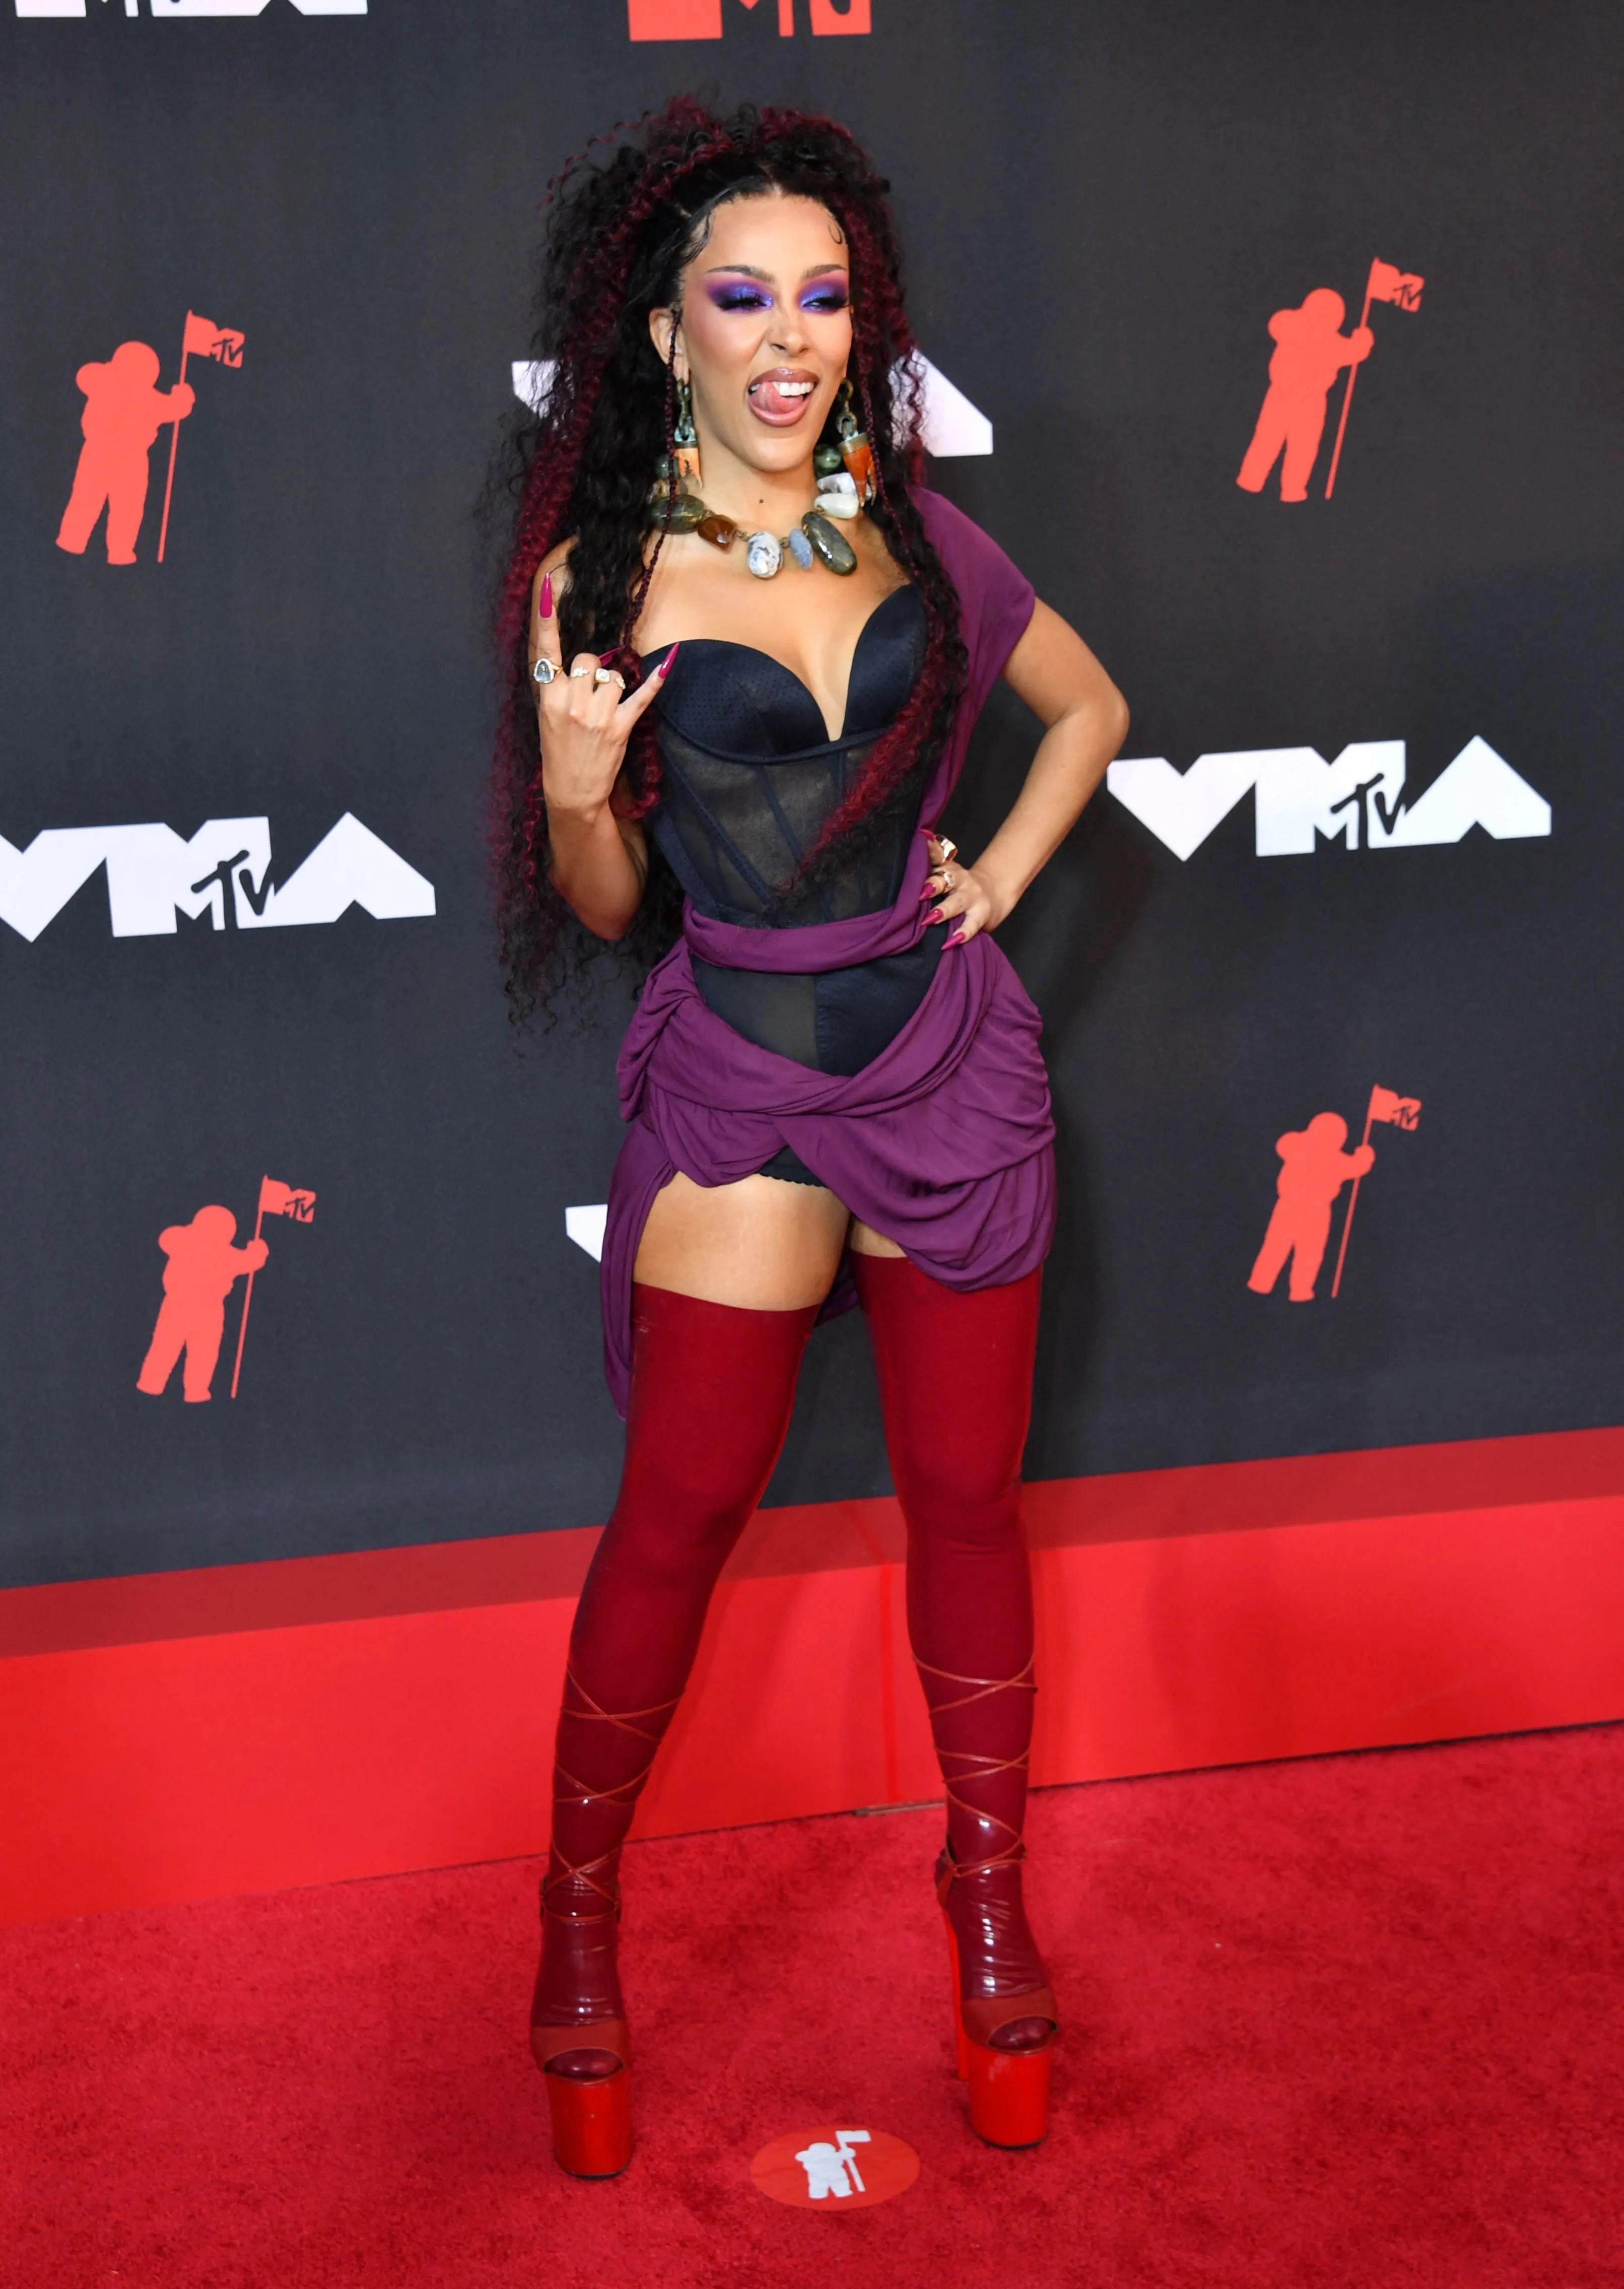 5fb0aa84 f3d4 4a21 b62e 5805bf93fbfc AFP AFP 9MQ4GZ Olivia Rodrigo, Doja Cat, Lil Nas X, MGK and more stars take over the VMAs red carpet